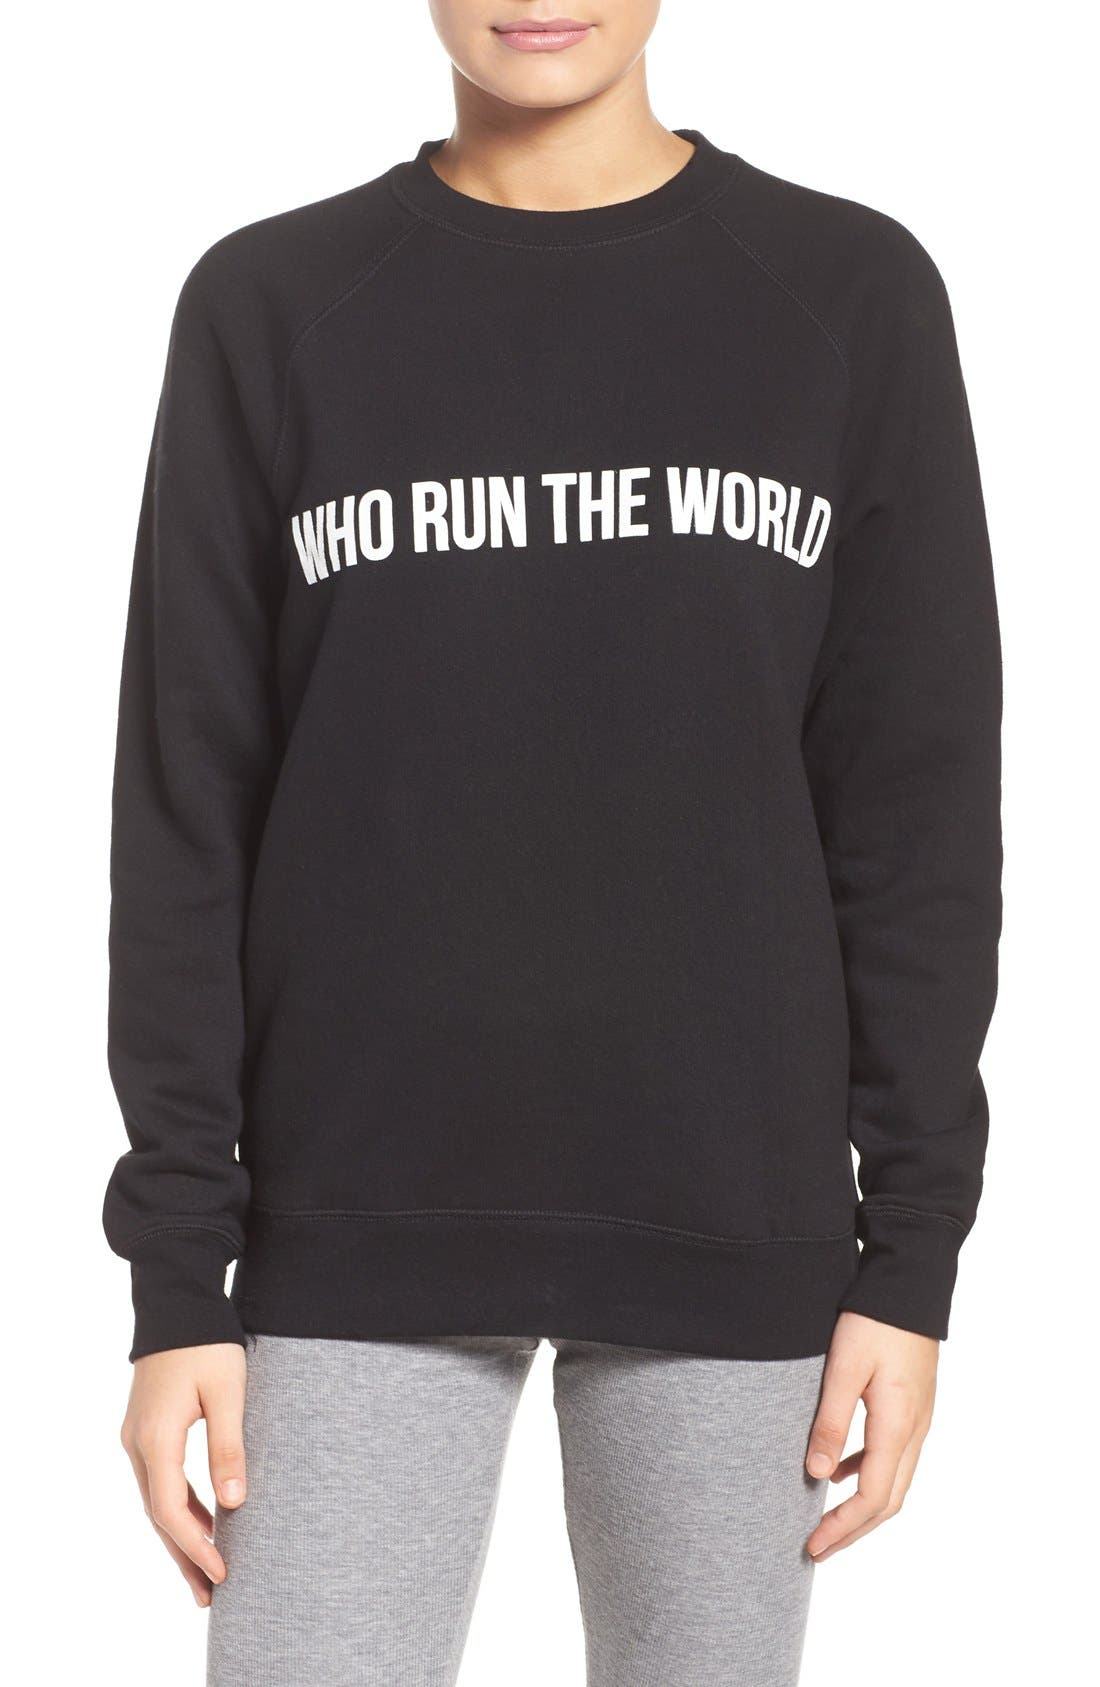 Who Run the World Sweatshirt,                         Main,                         color, Black